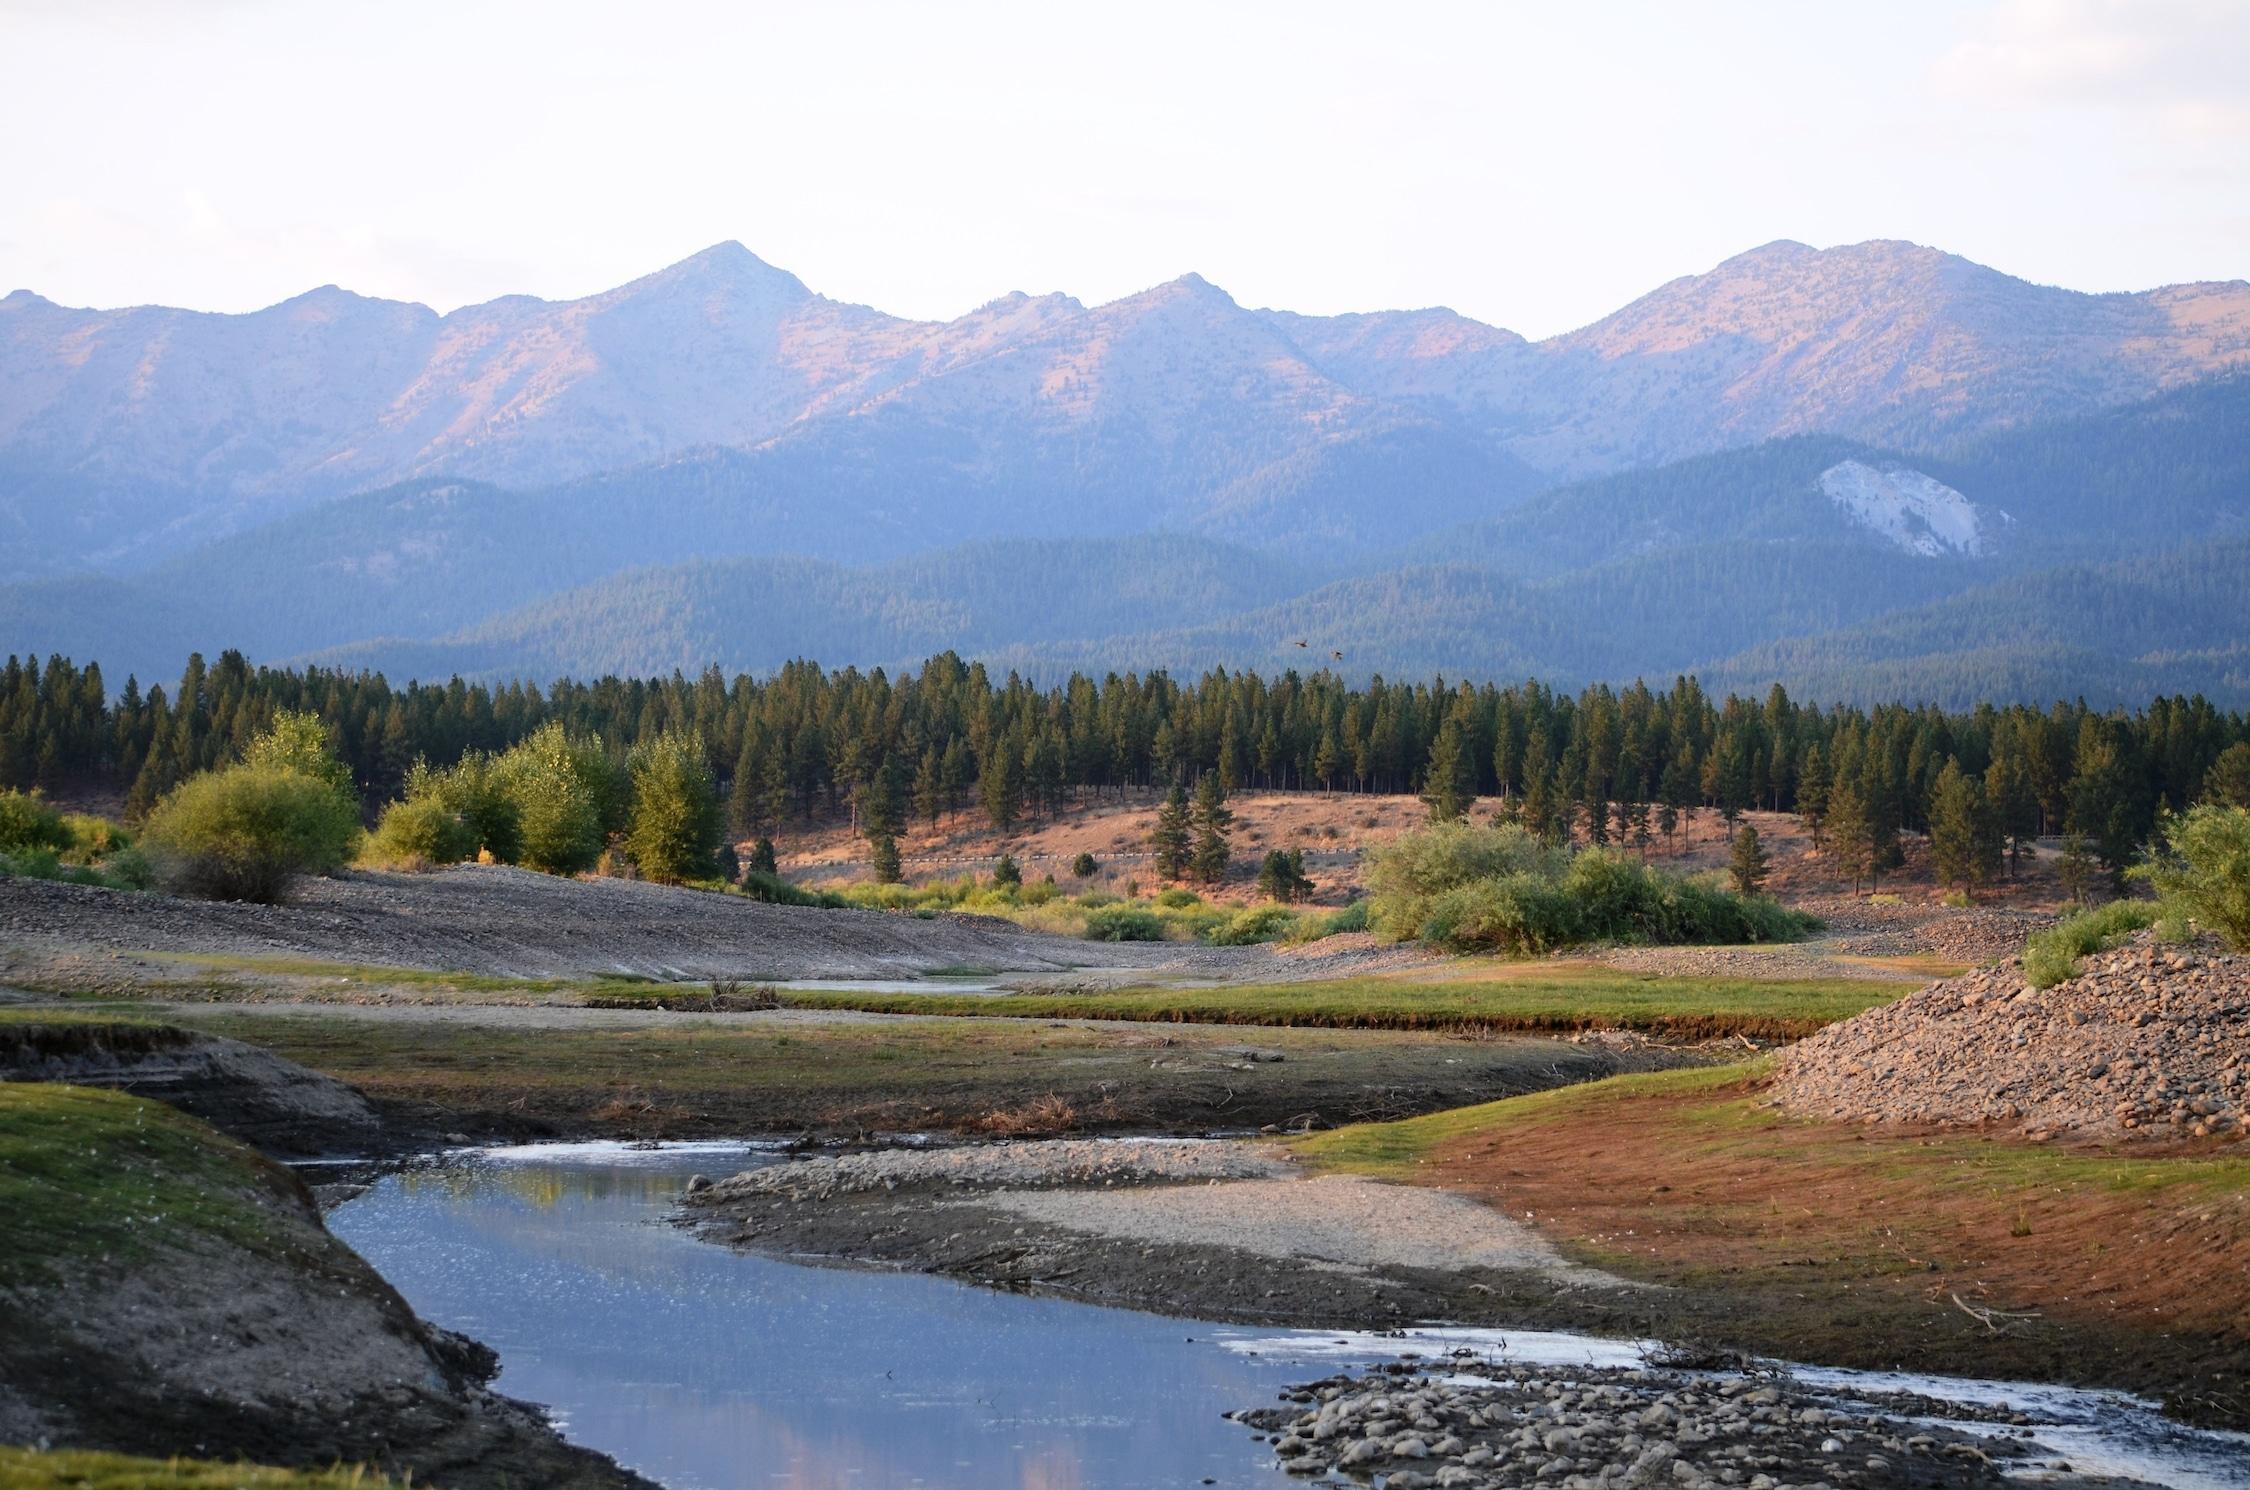 River through the Valley